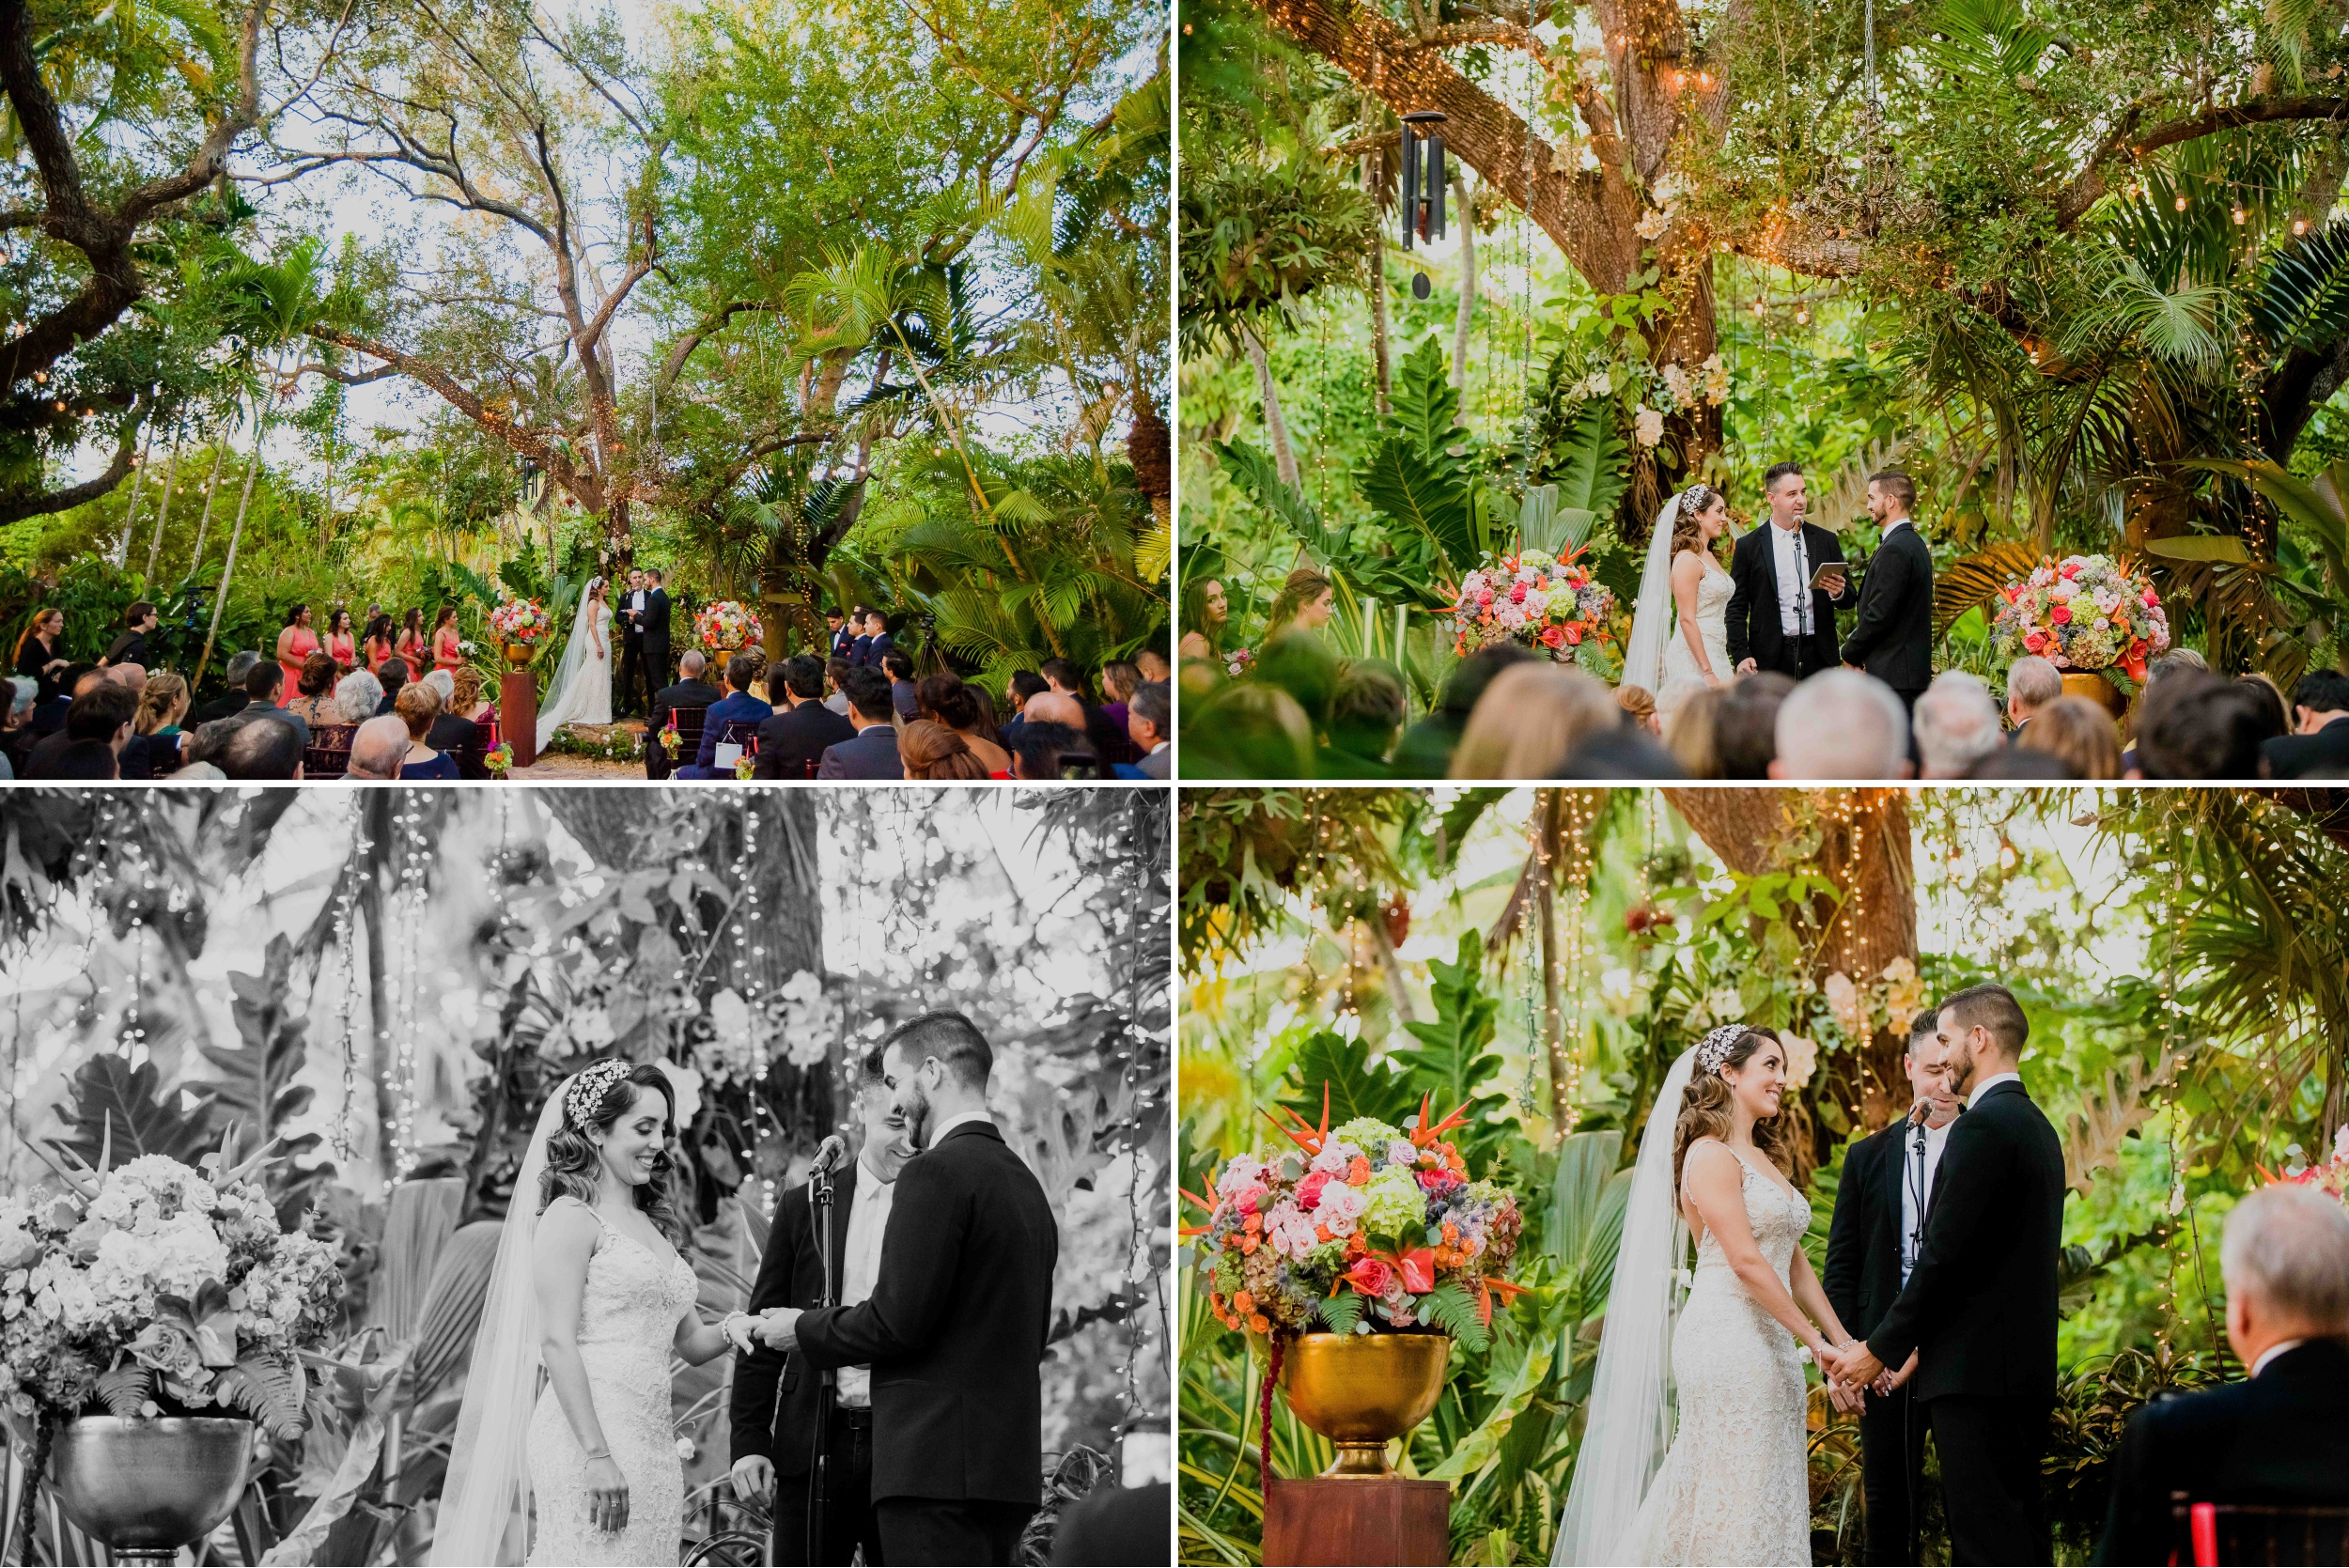 Wedding Miller Plantation Photography by Santy Martinez 11.jpg